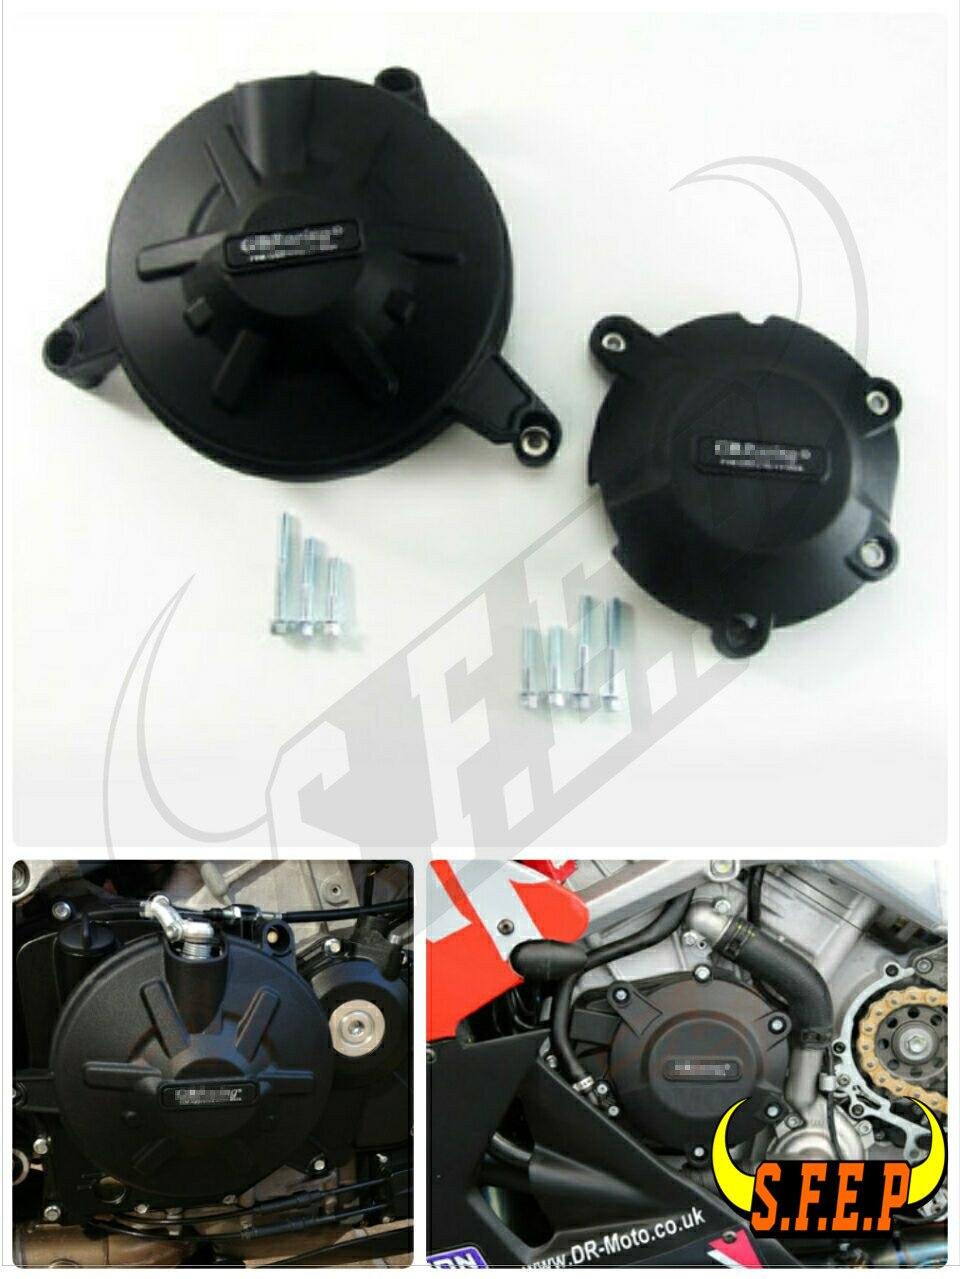 GB Corridas de Motor da motocicleta Caso Guard Protector Capa Para GB Corrida por Aprilia RSV4 2010-2018/RSV4 RR 2015-2018 Preto